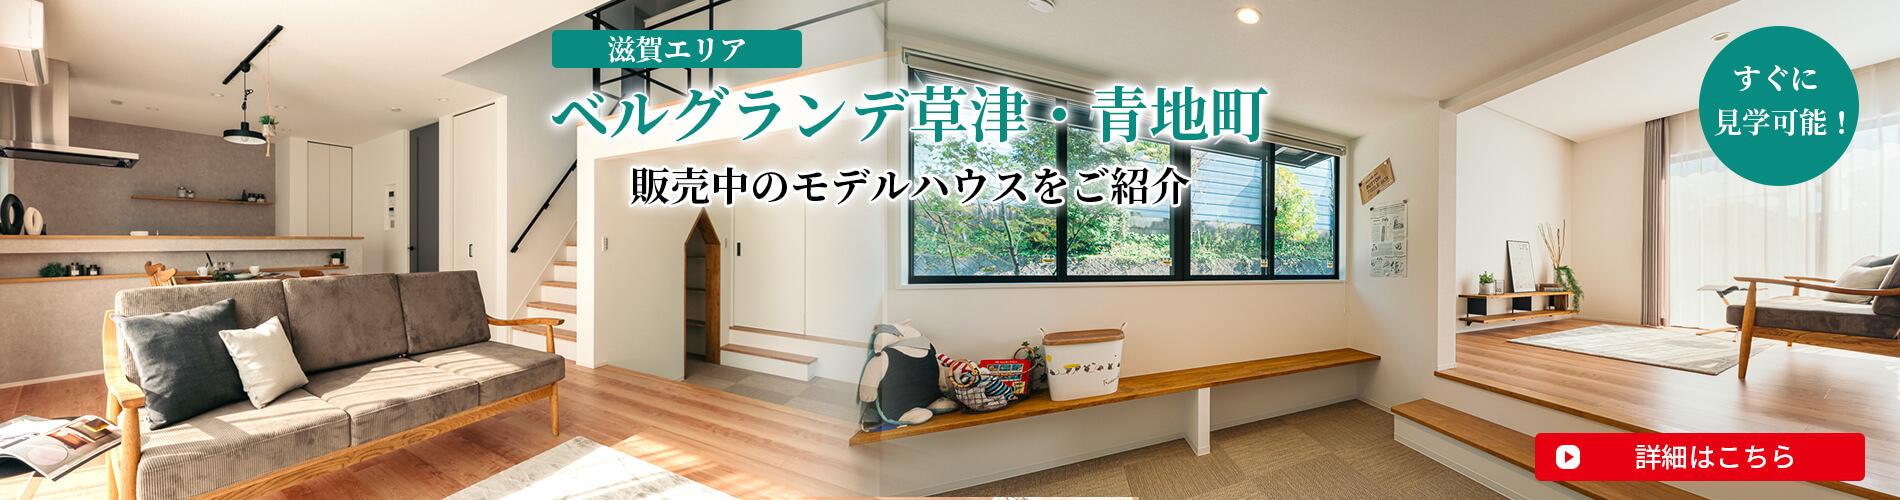 https://www.shikishima-j.co.jp/app-def/S-102/corporate/wp-content/uploads/2021/09/yamashina_misasagi.jpg